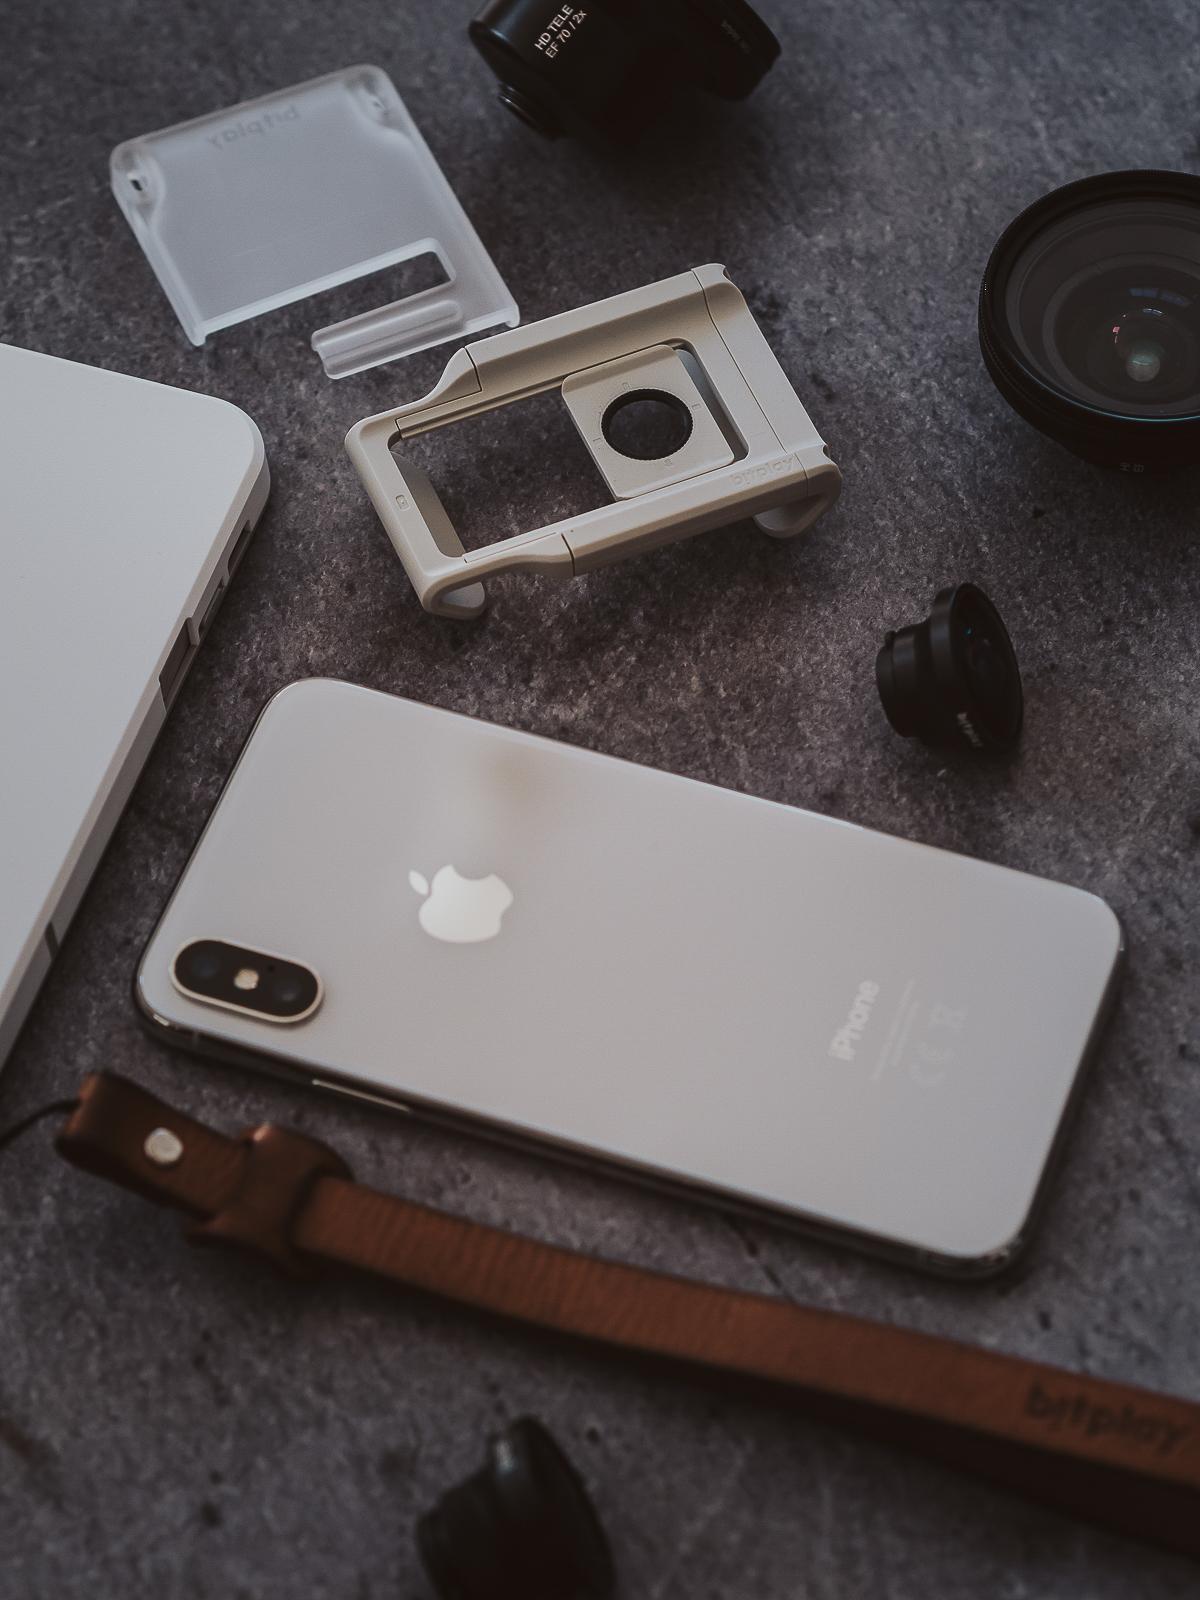 bitplay AllClip & iPhoneX + Samsung Galaxy Note9 - Olympus EM1Markii4518 - Yes! Please Enjoy-17.jpg